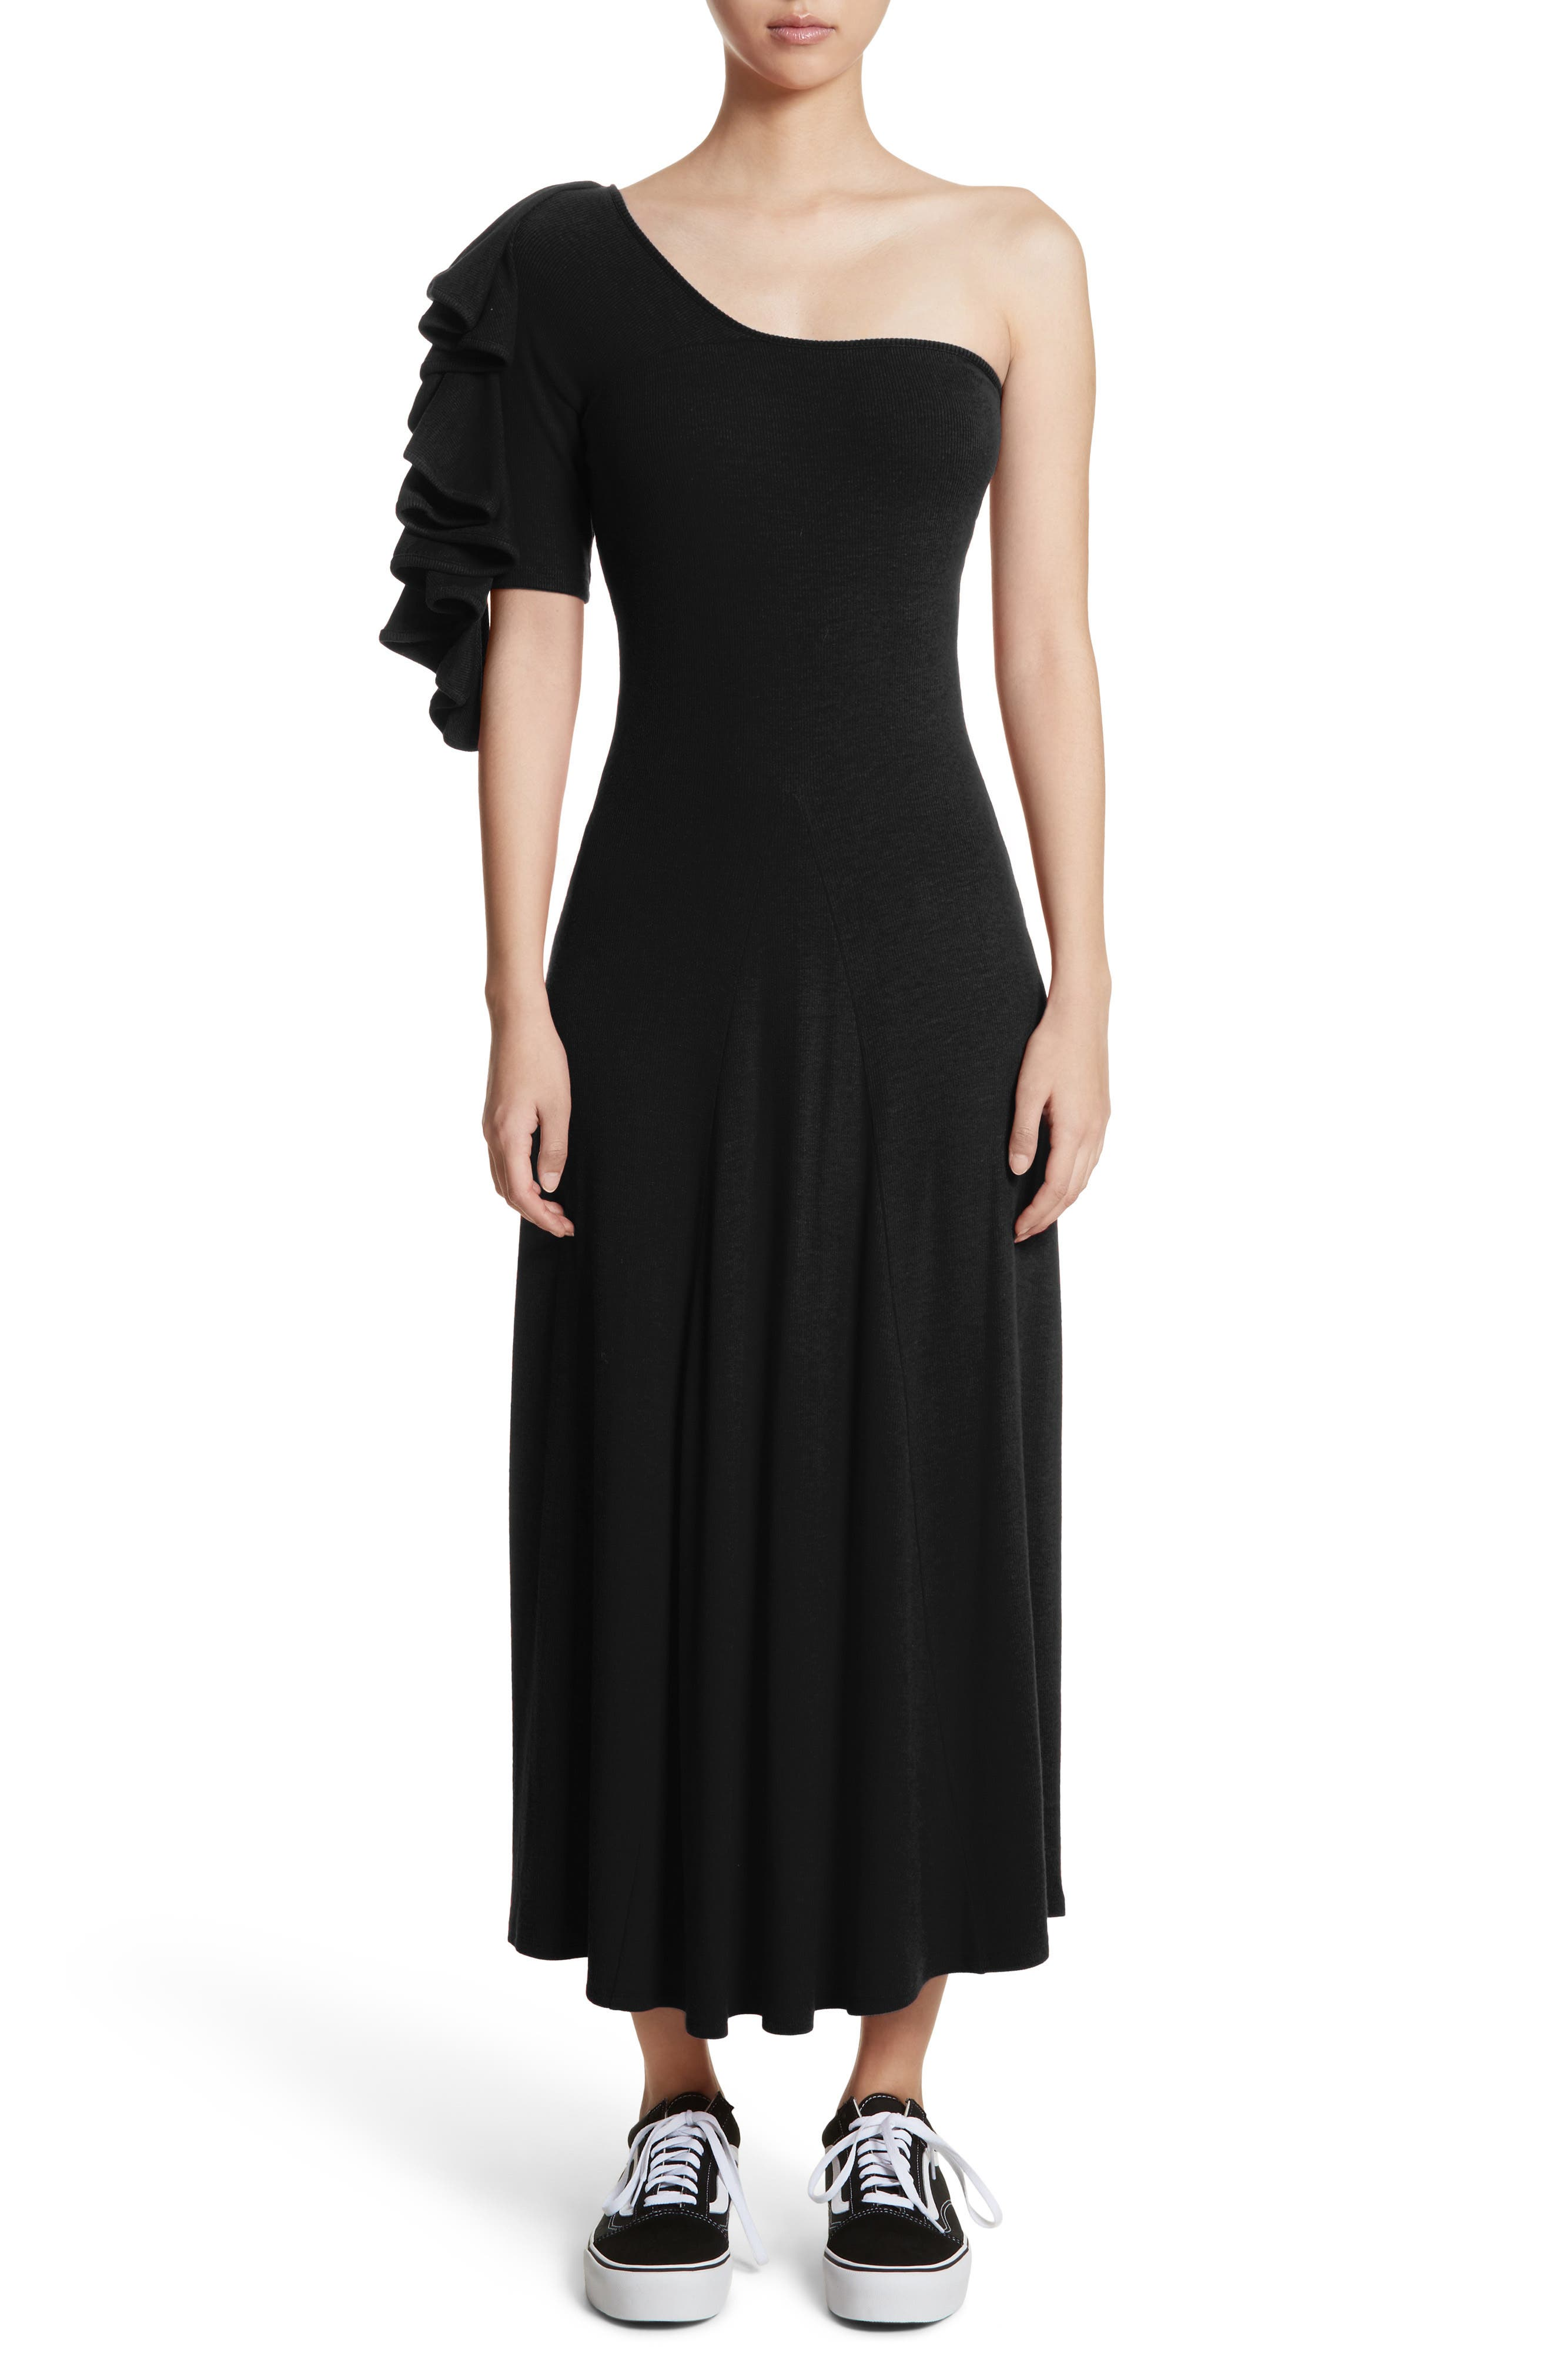 Beaufille Dione One-Shoulder Dress